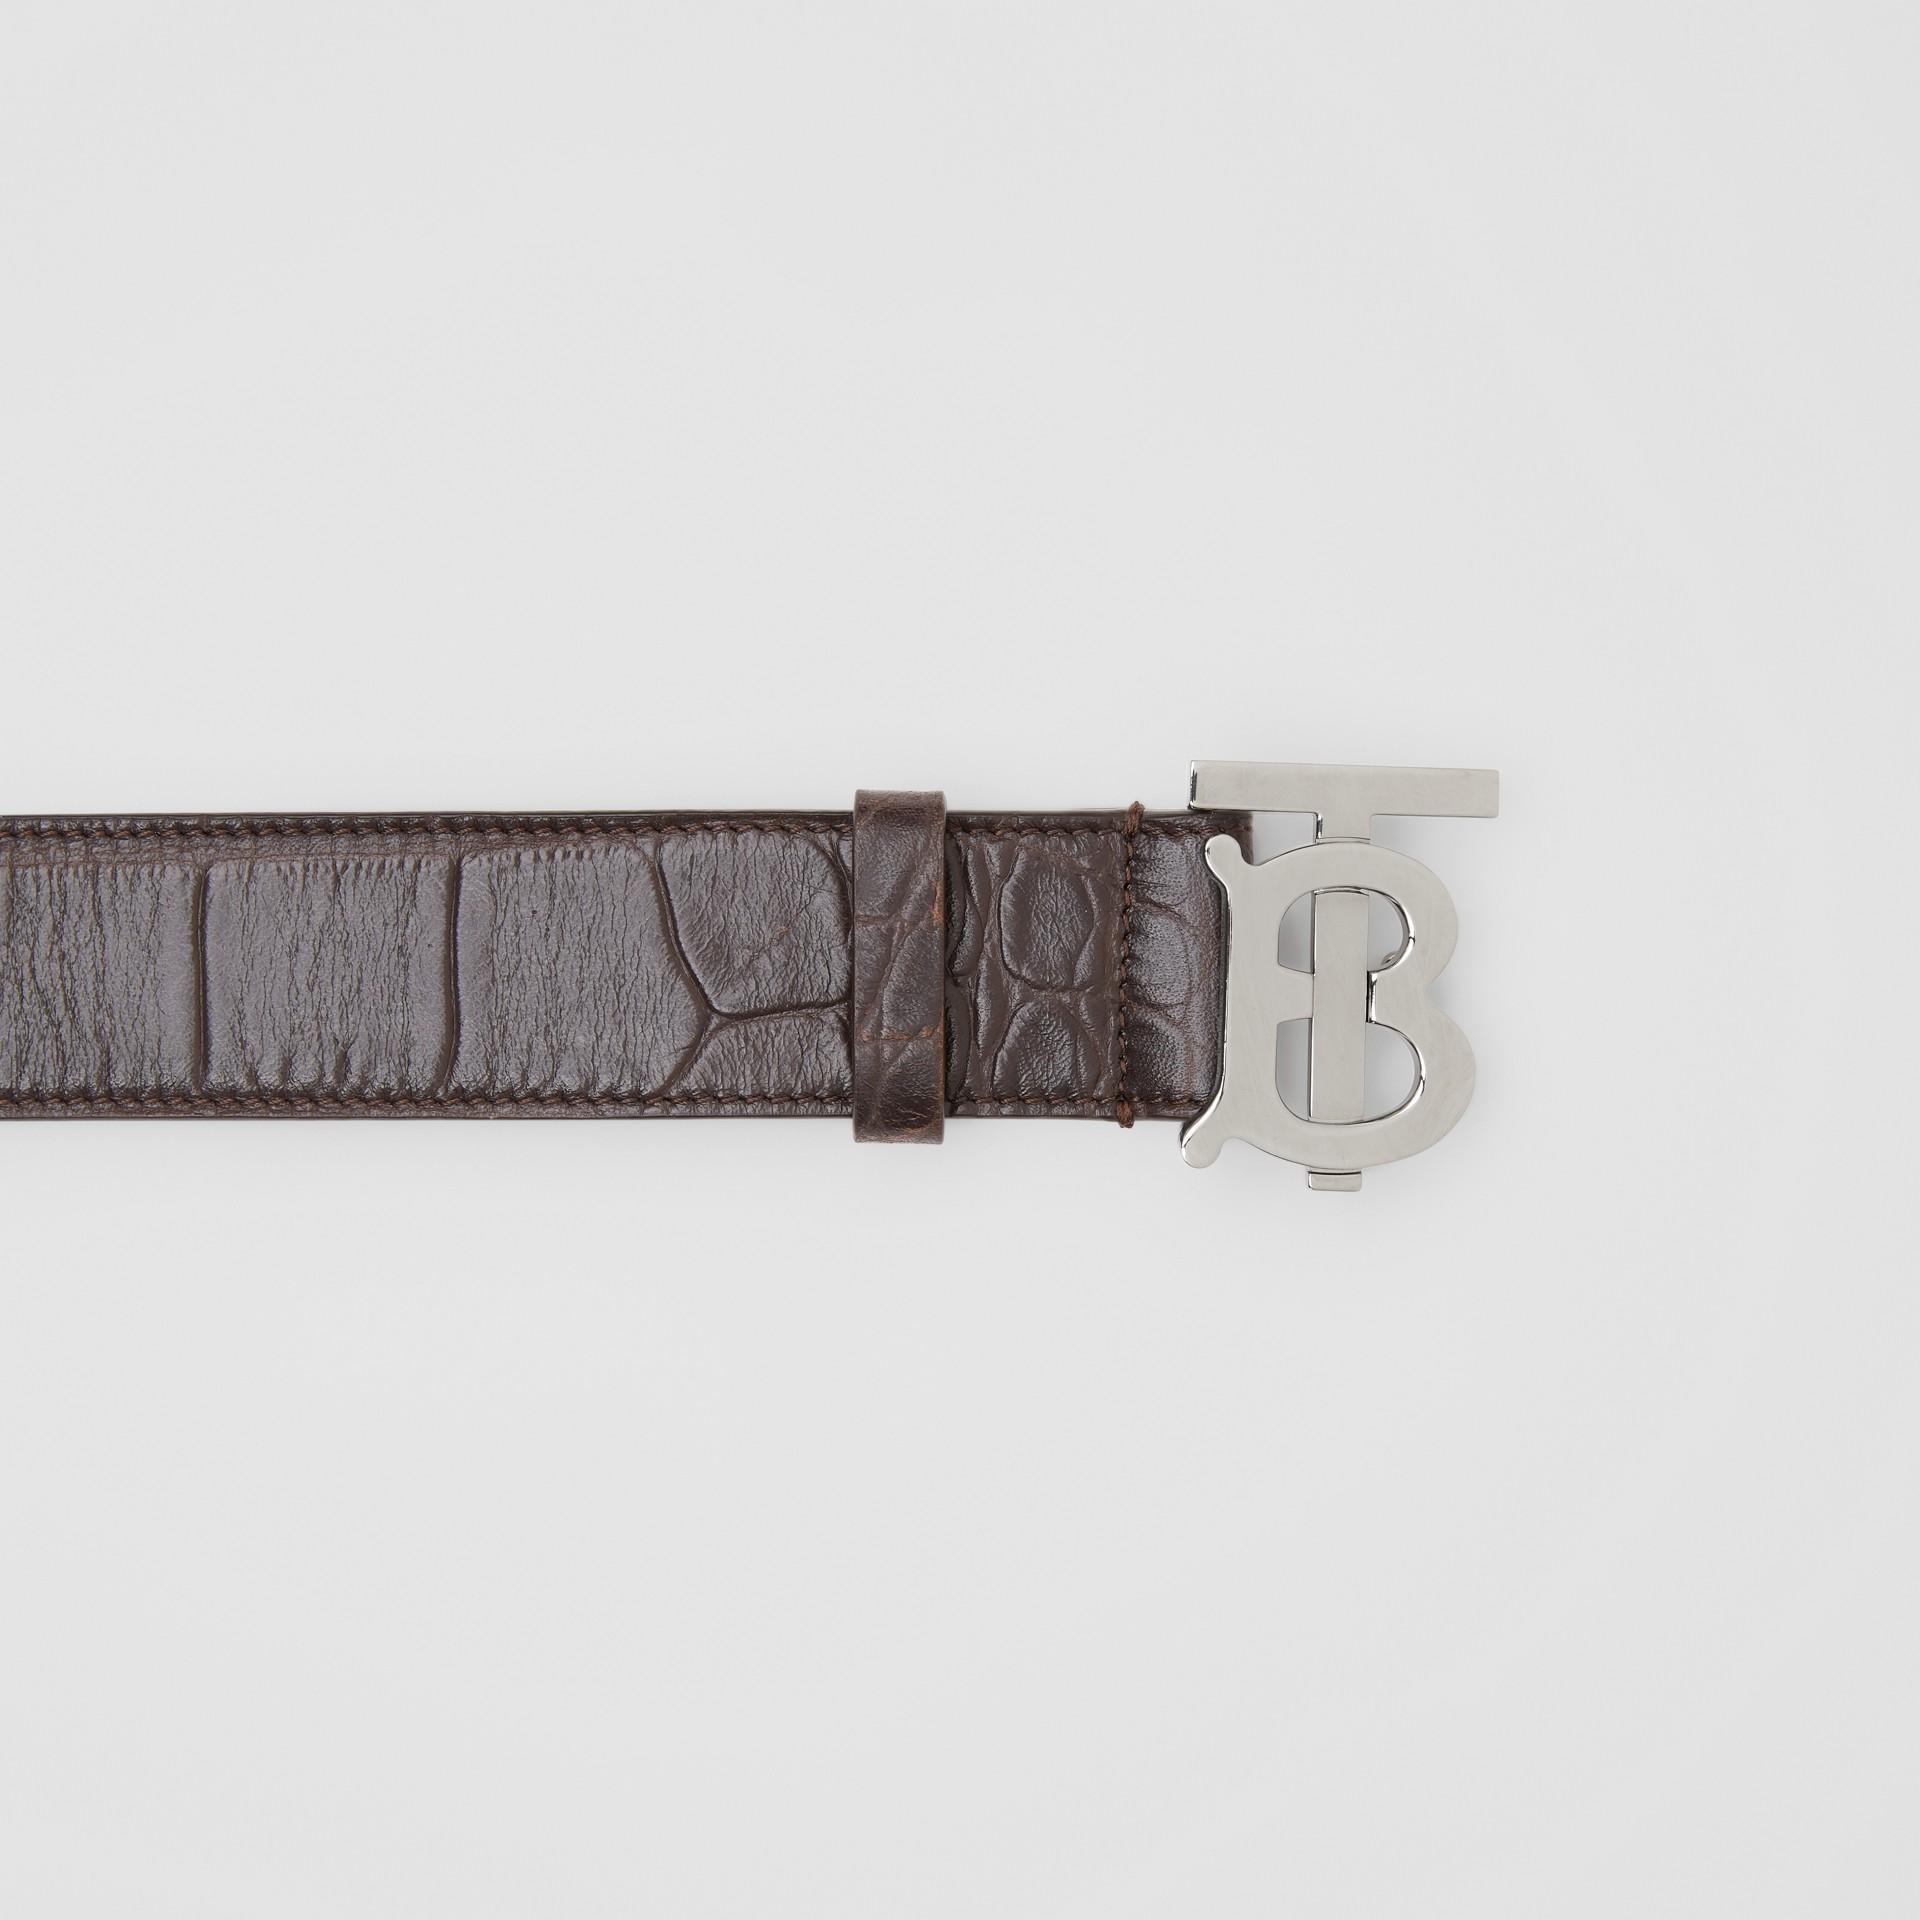 Monogram Motif Embossed Leather Belt in Brown - Men | Burberry - gallery image 1